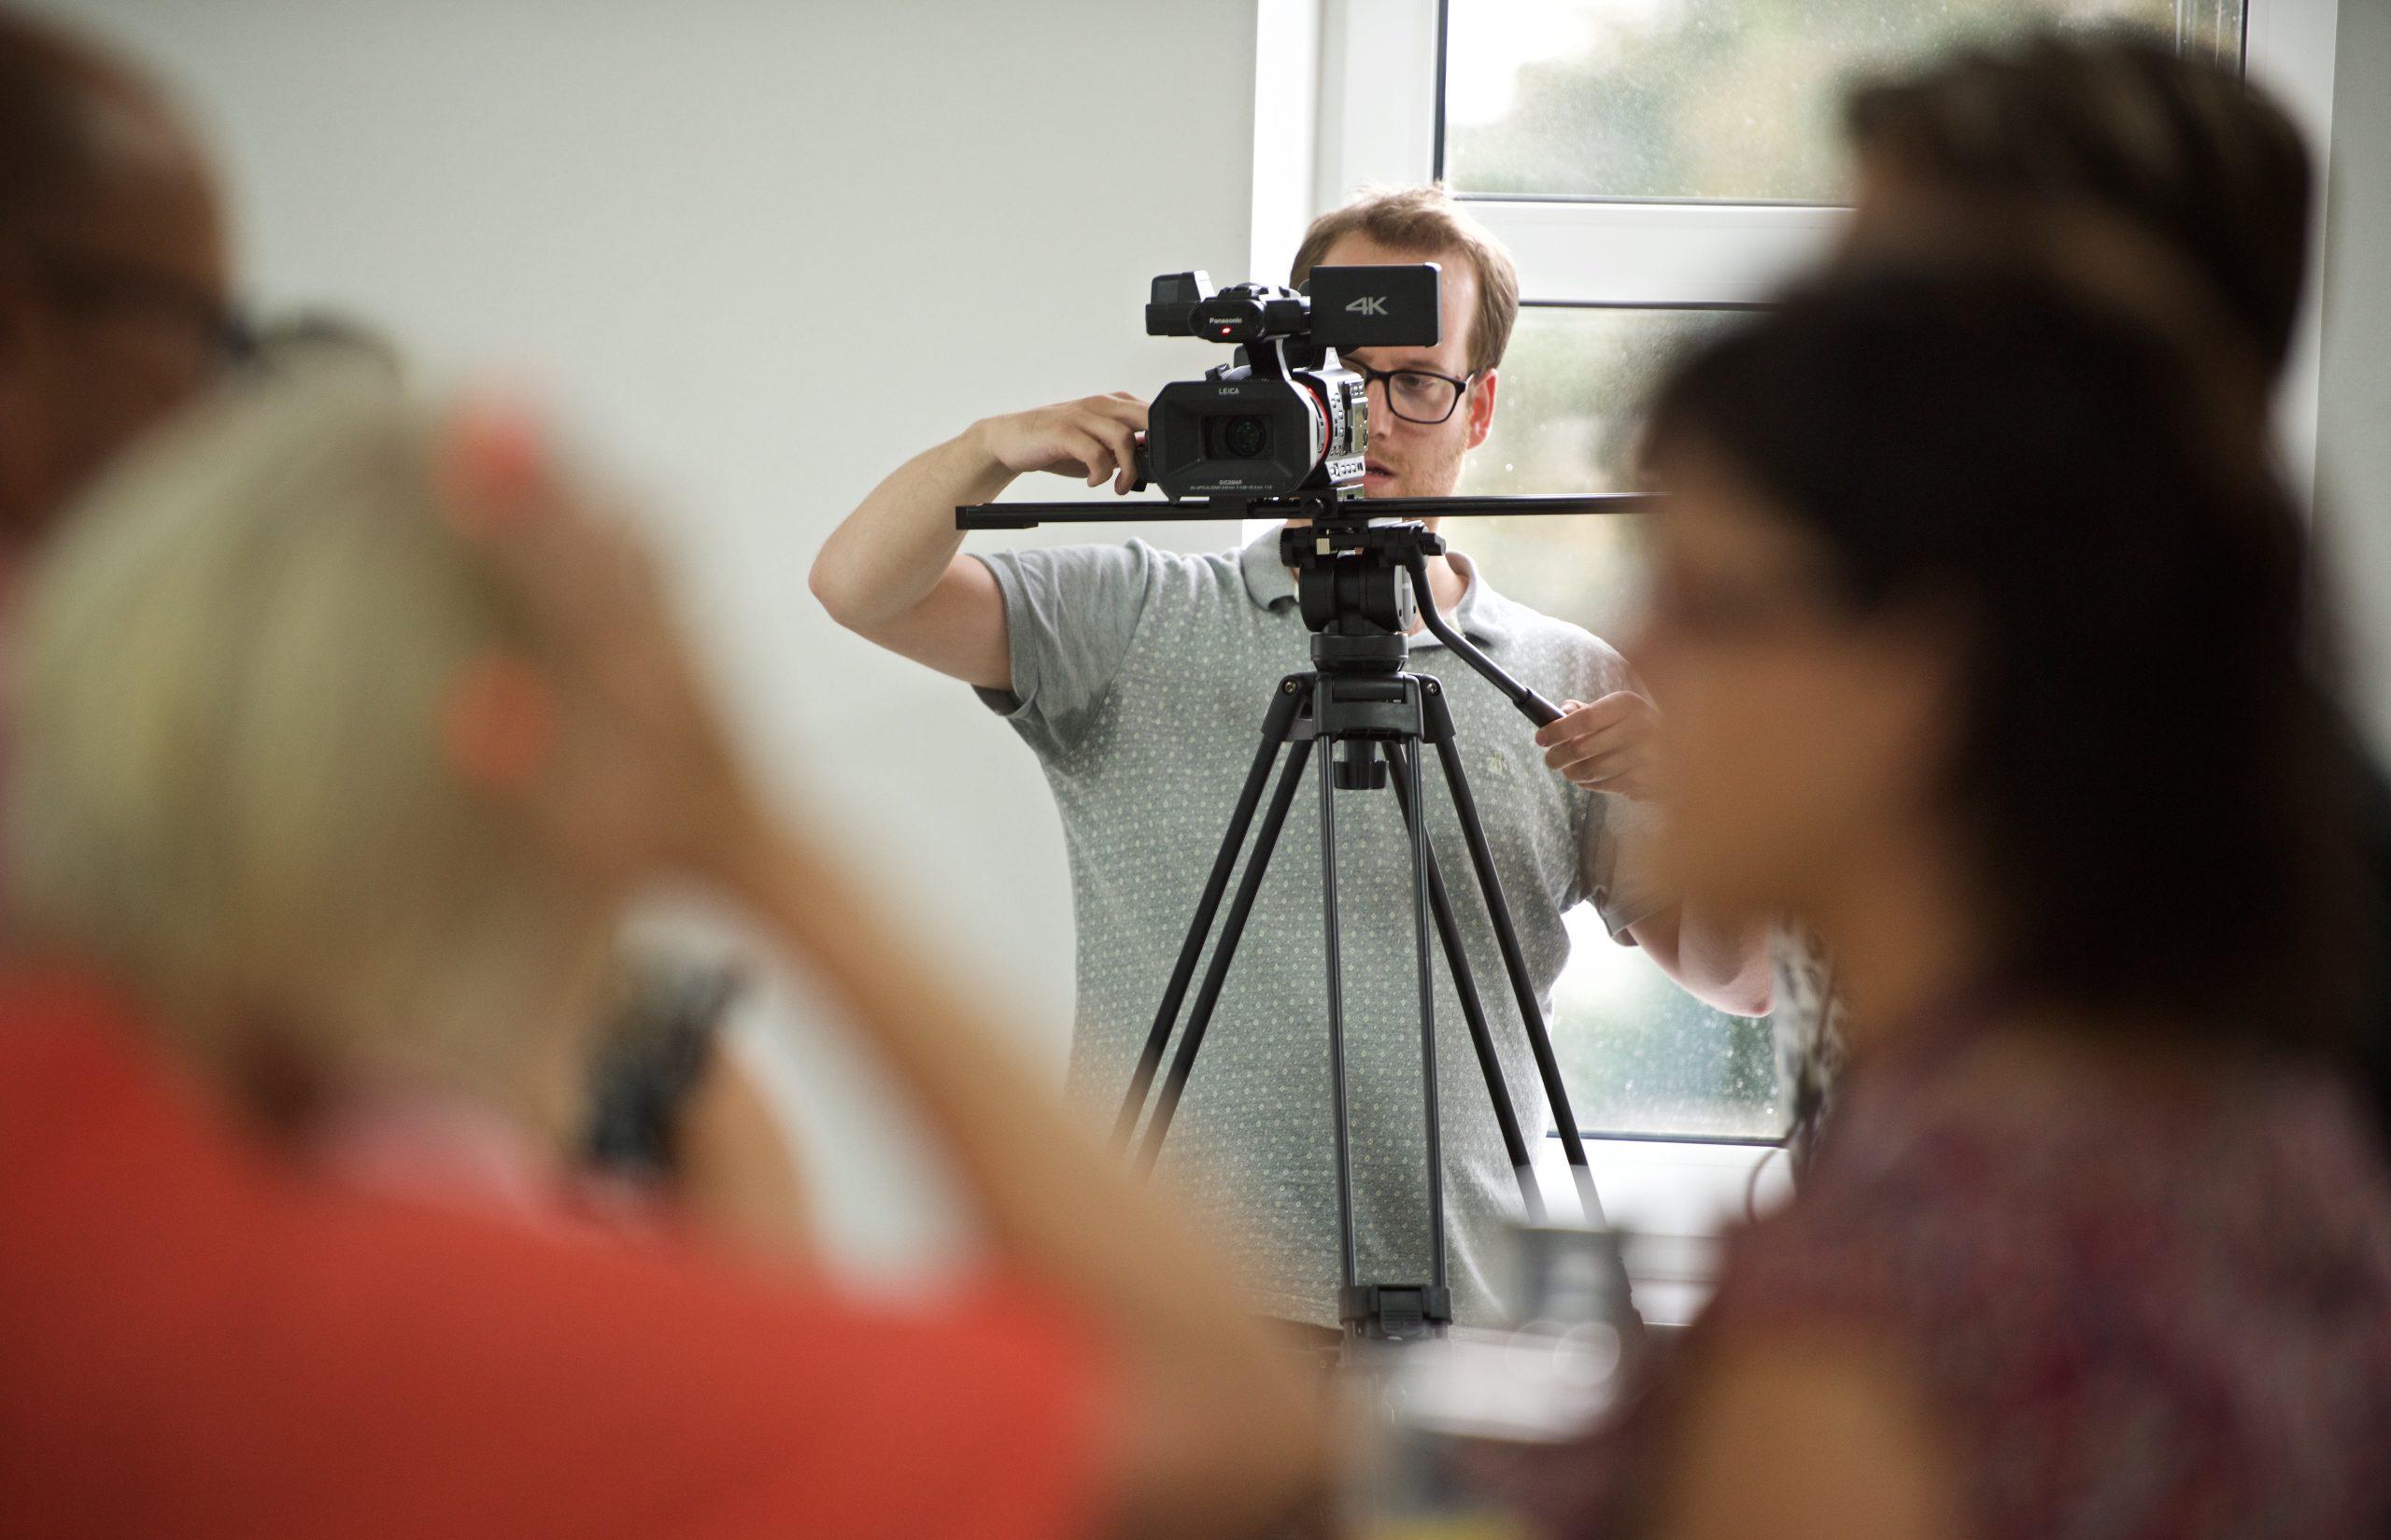 Futurist Media Events Videography